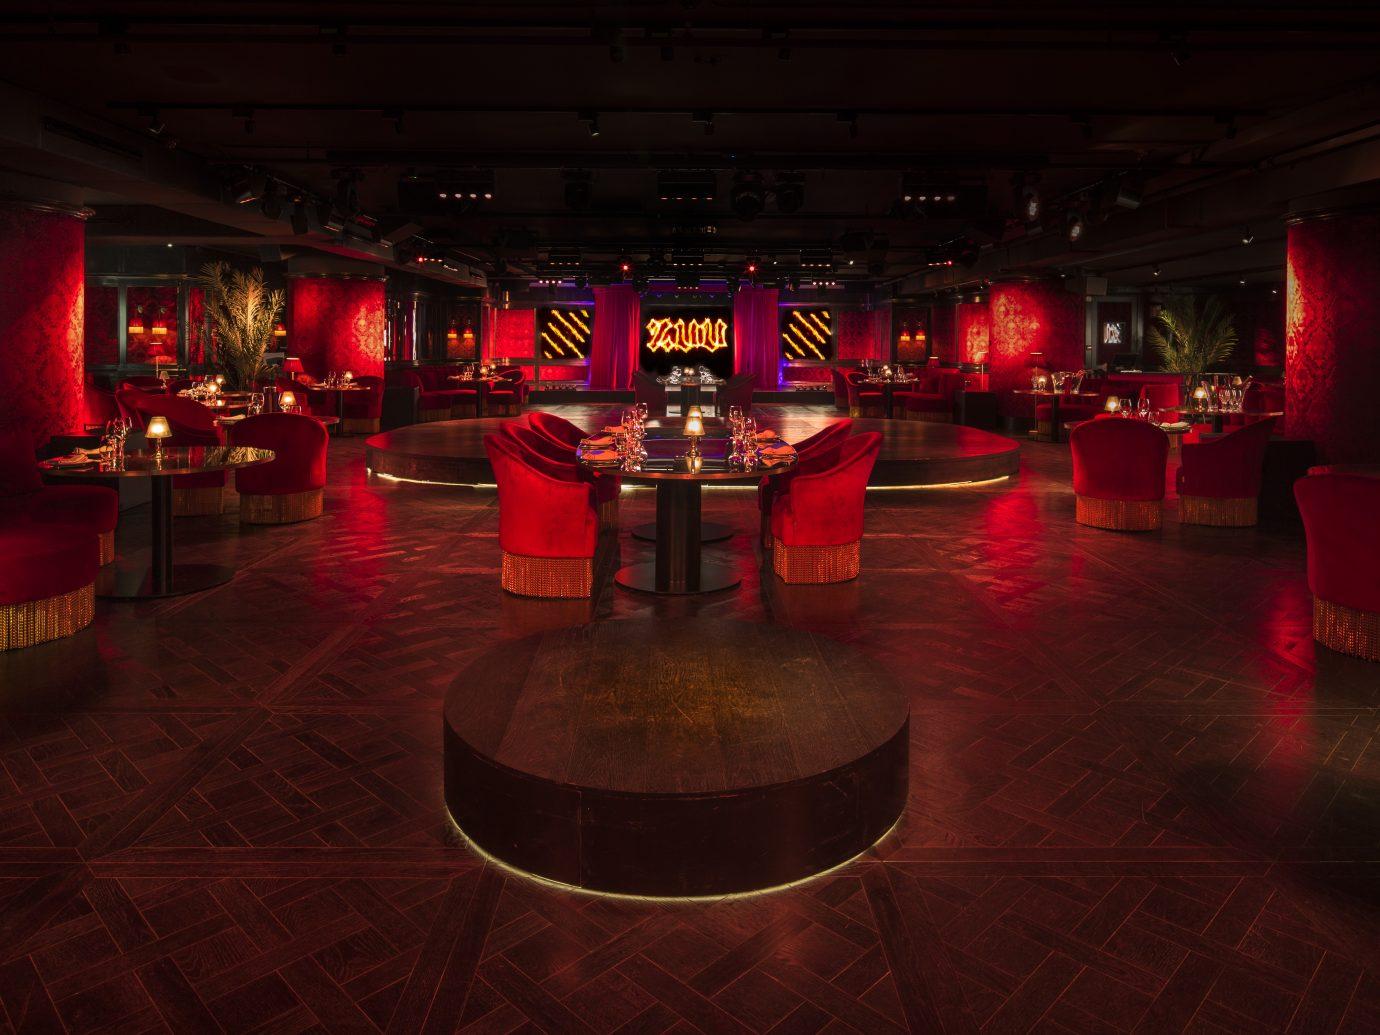 Zuu nightclub